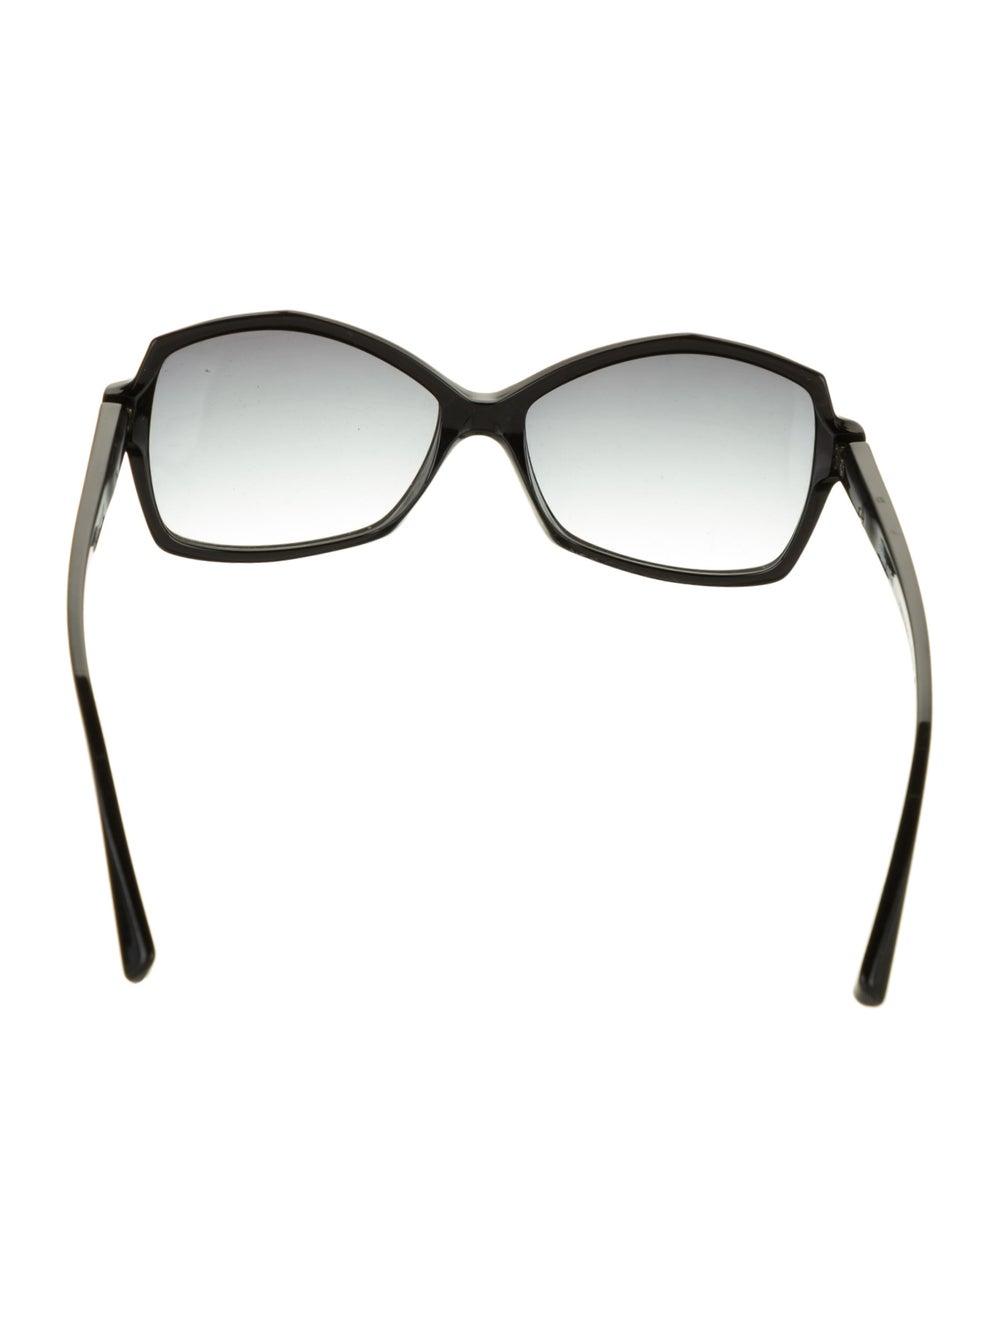 Alain Mikli Gradient Square Sunglasses Black - image 3